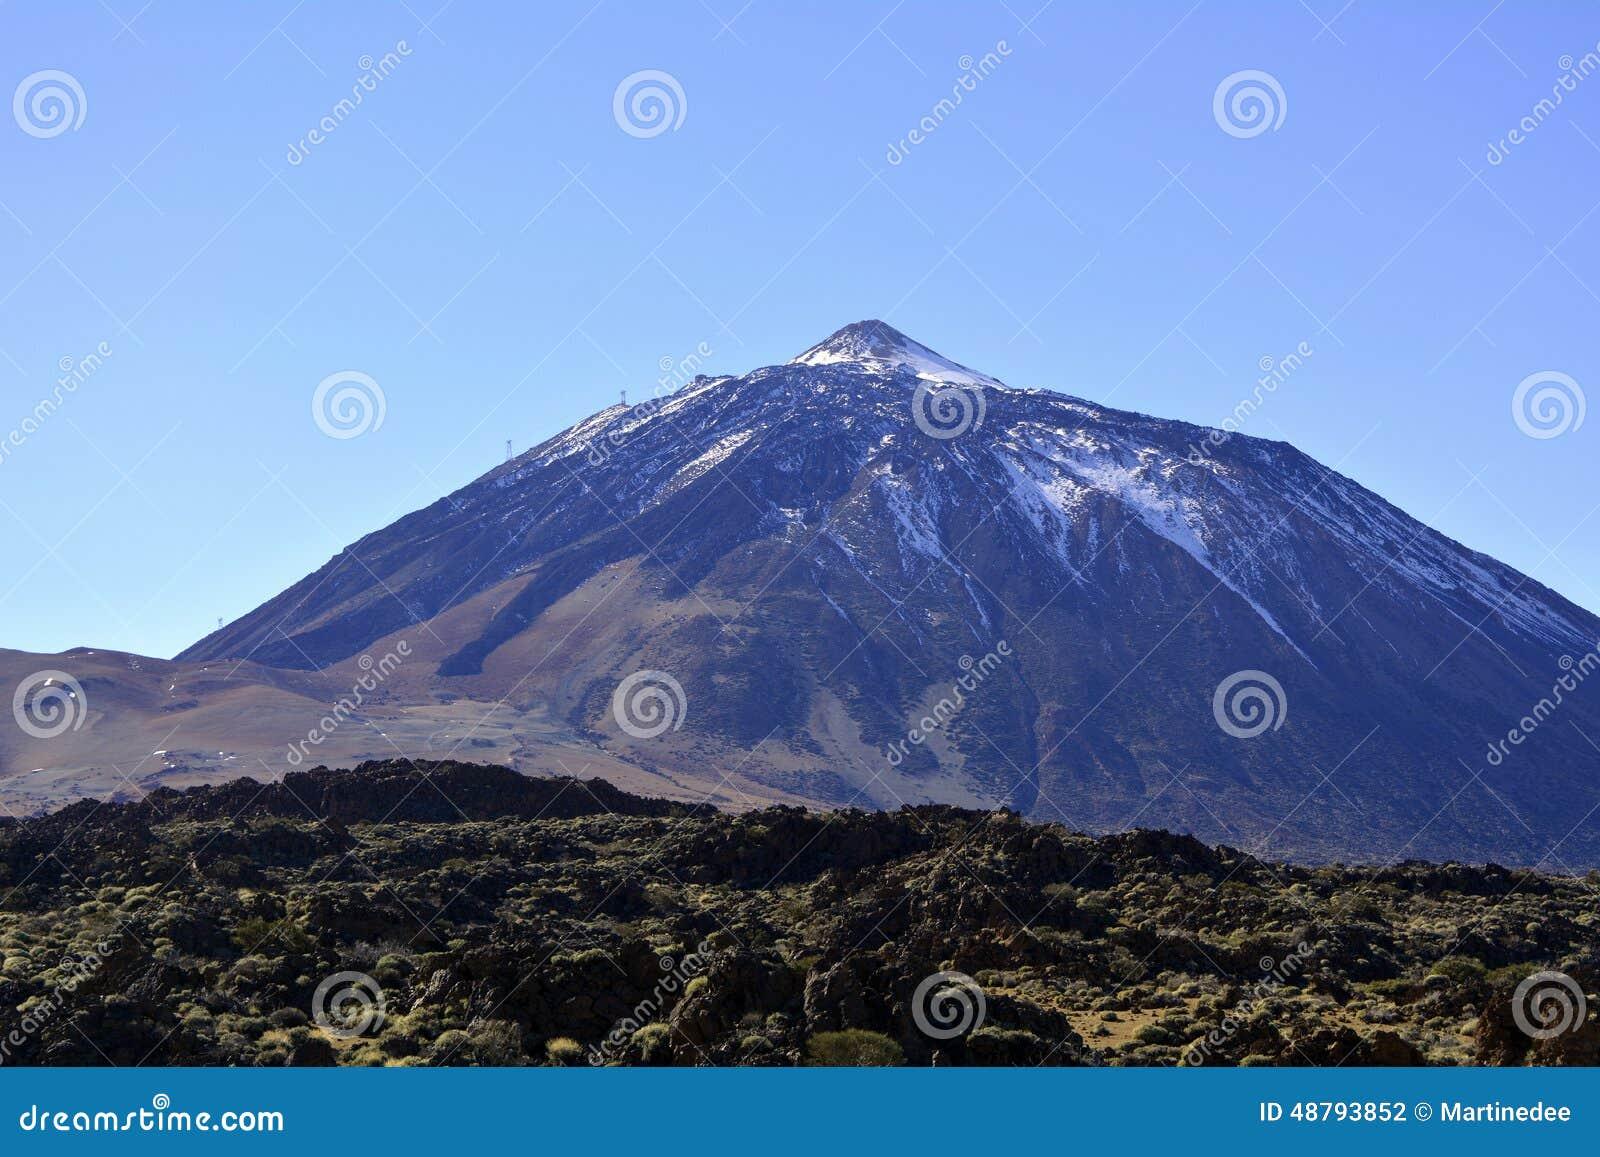 Mountain Teide In Tenerife Canary Islands Spain Stock Photo Picco Latte Matcha Green Tea Can Pico De